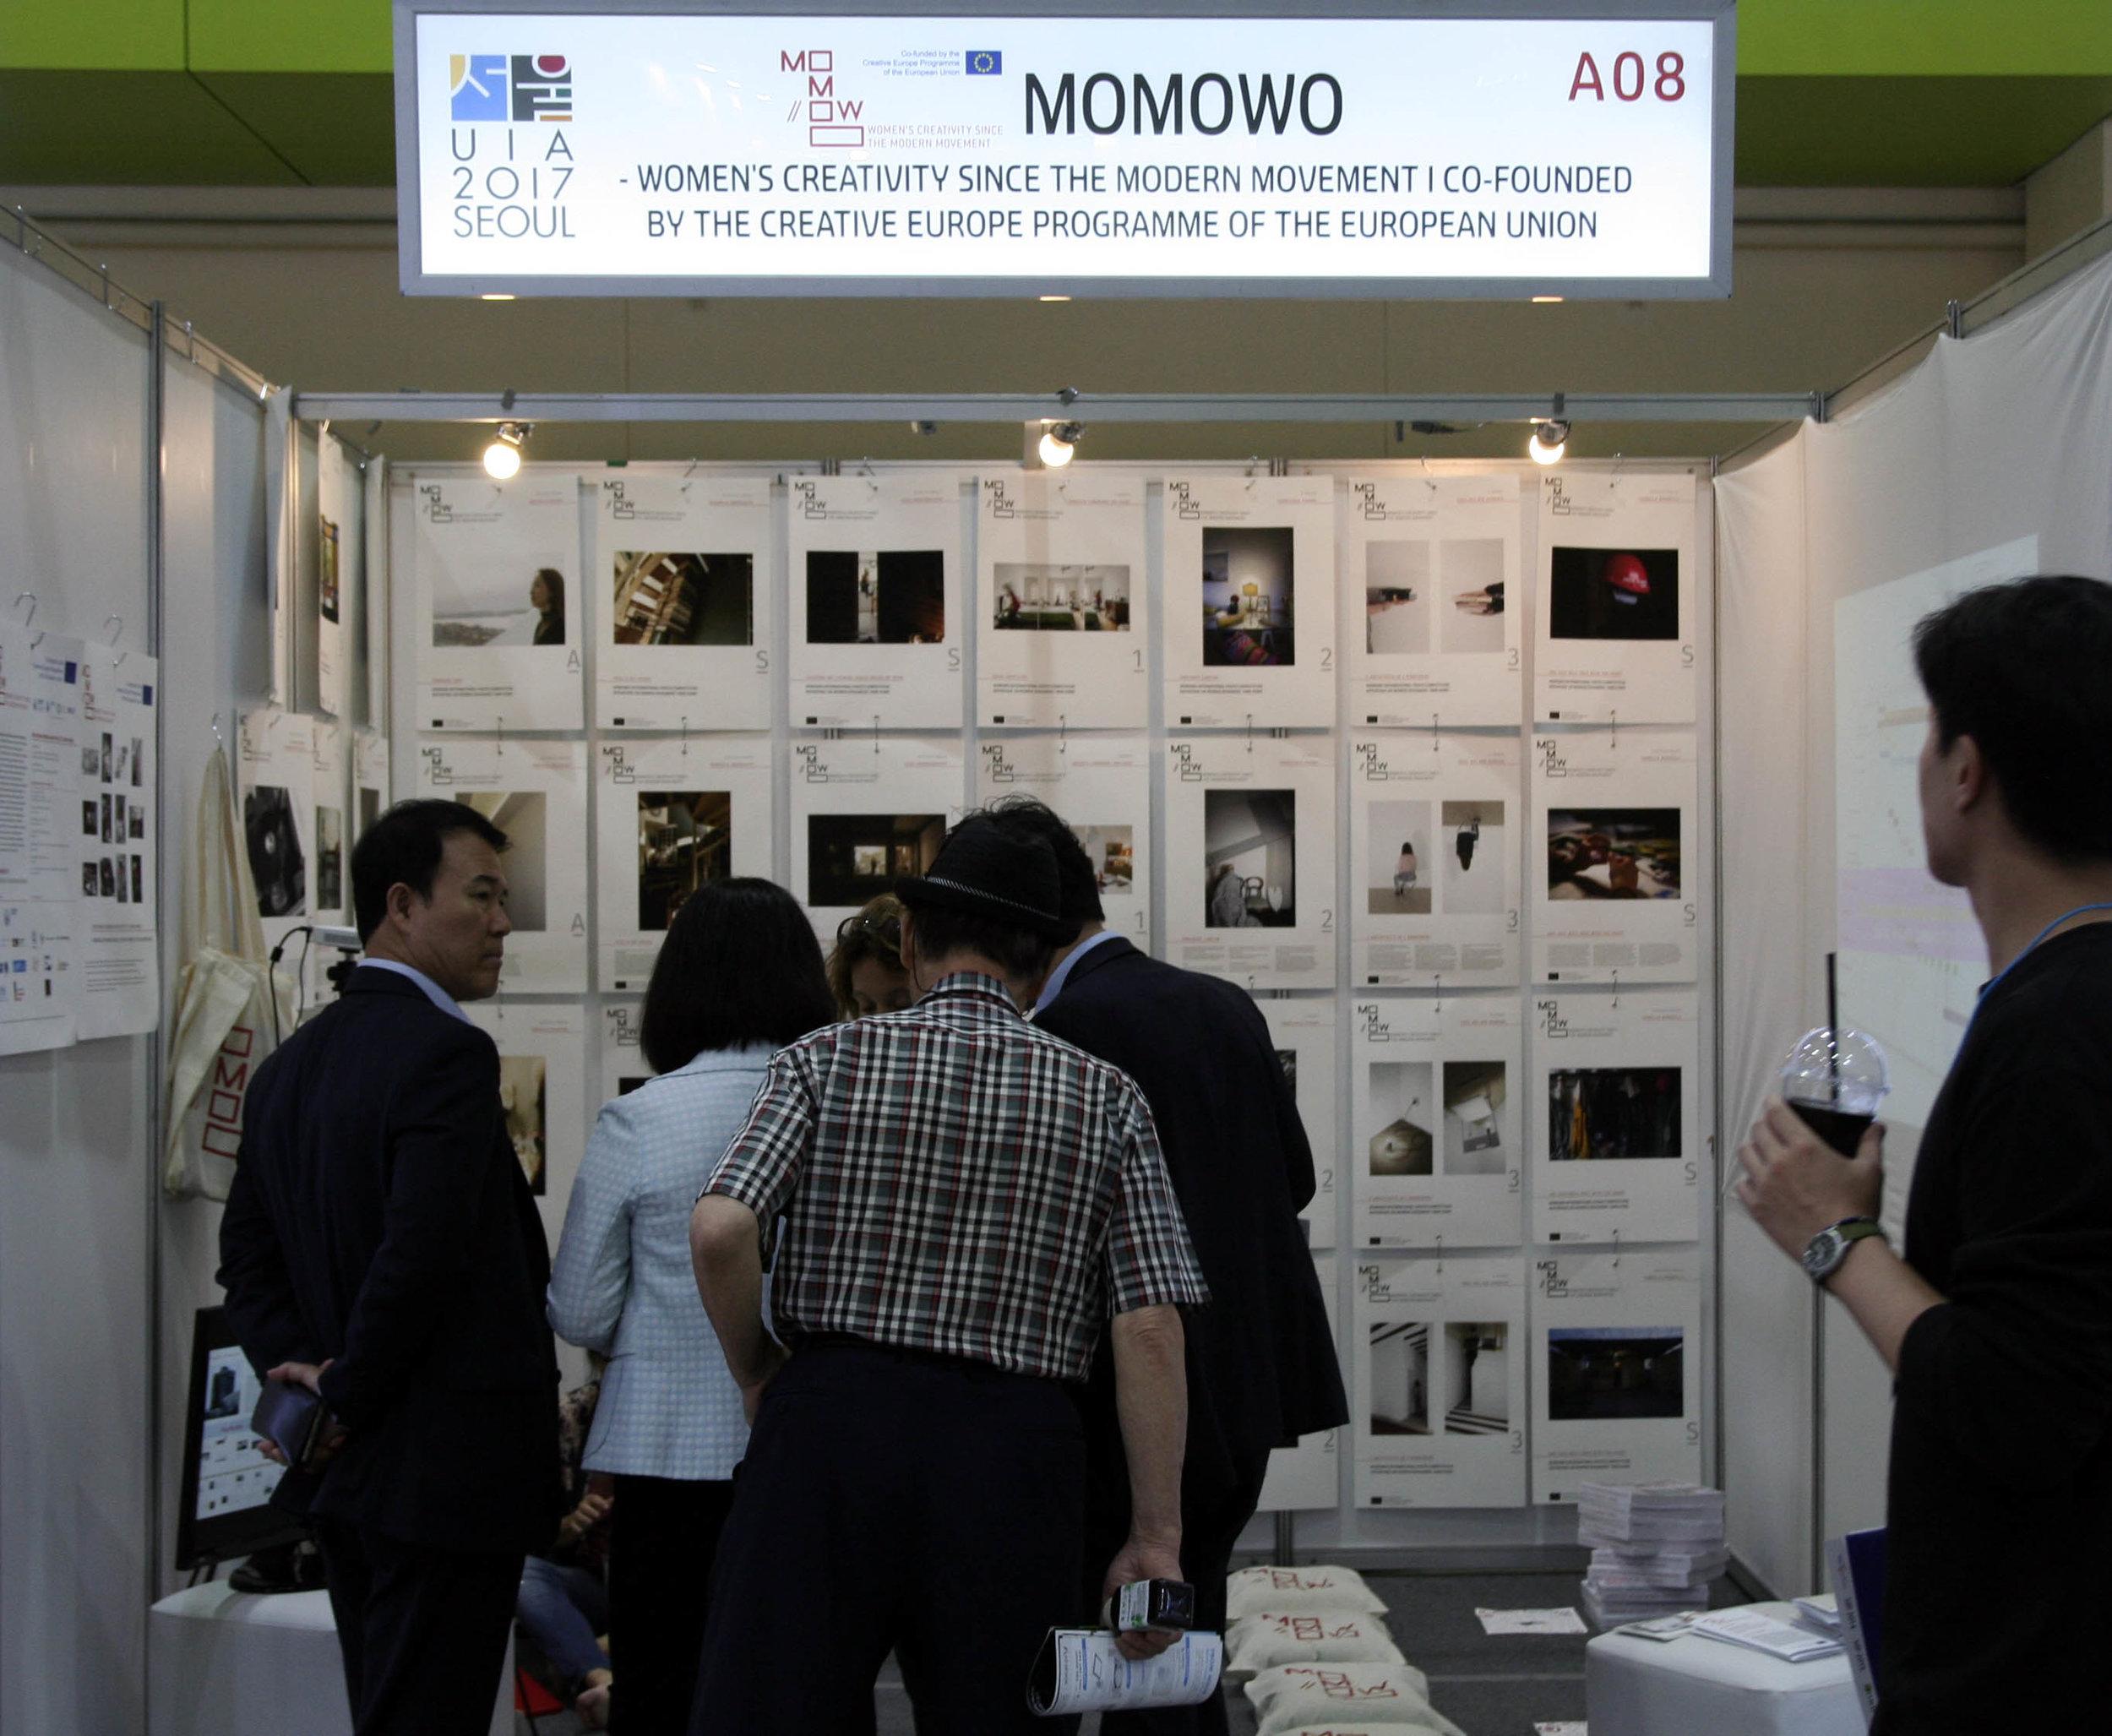 MoMoWo at the UIA Seoul Word Architect Congress 2017 Coex, Seoul (South Korea), 7-10 September 2017, photo: Caterina Franchini